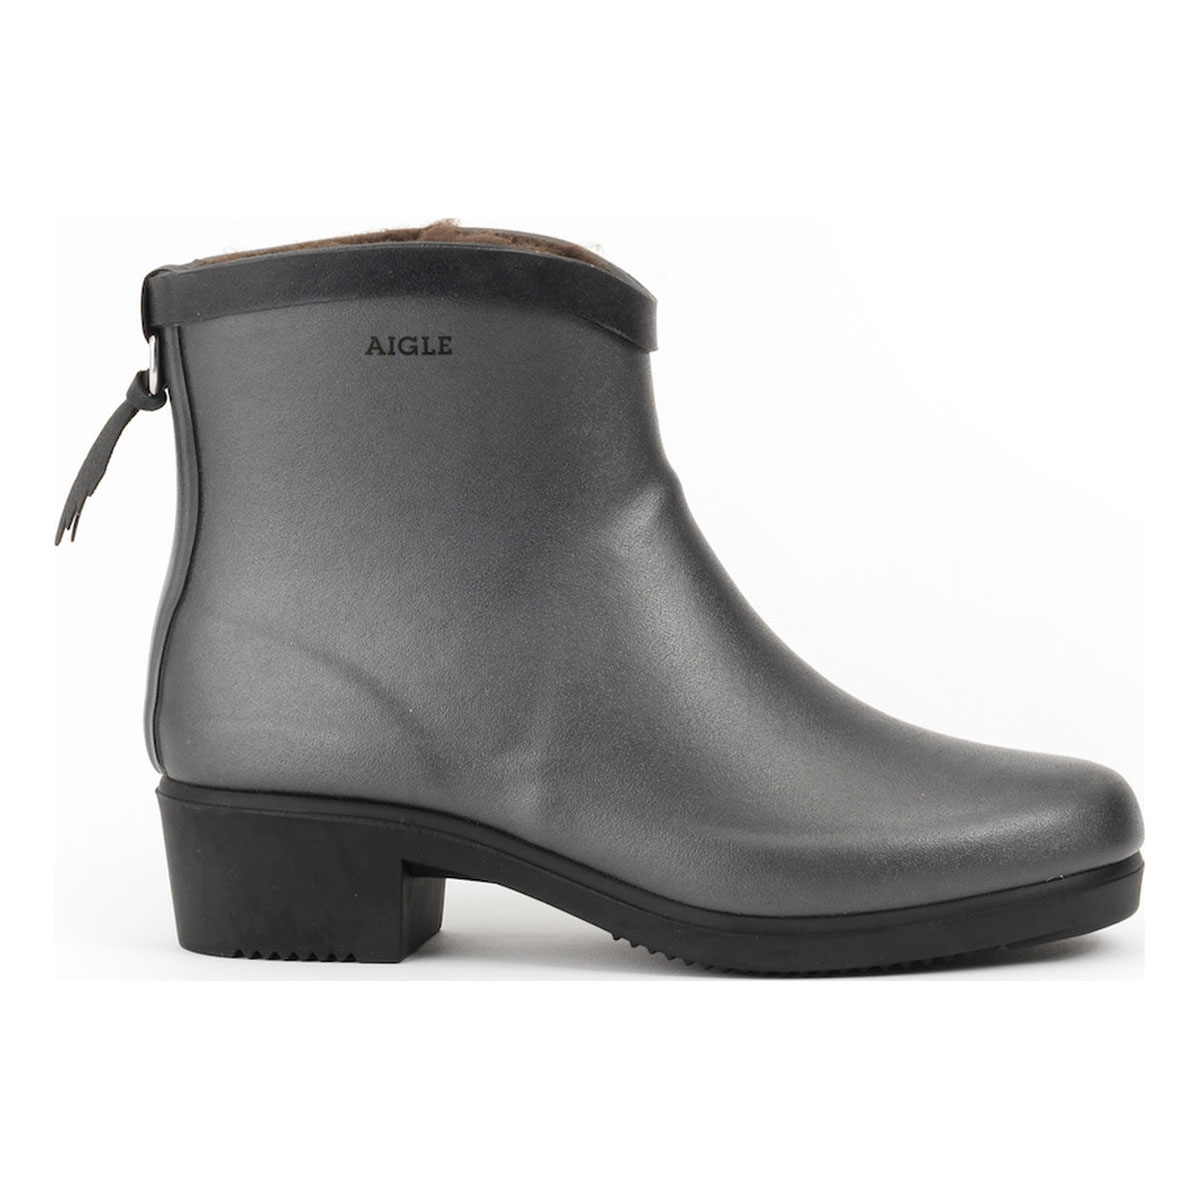 b62bd265b4ac4 Image of Aigle Miss Juliette Bottillon Fur Ankle Boots (Women s) - Metallic